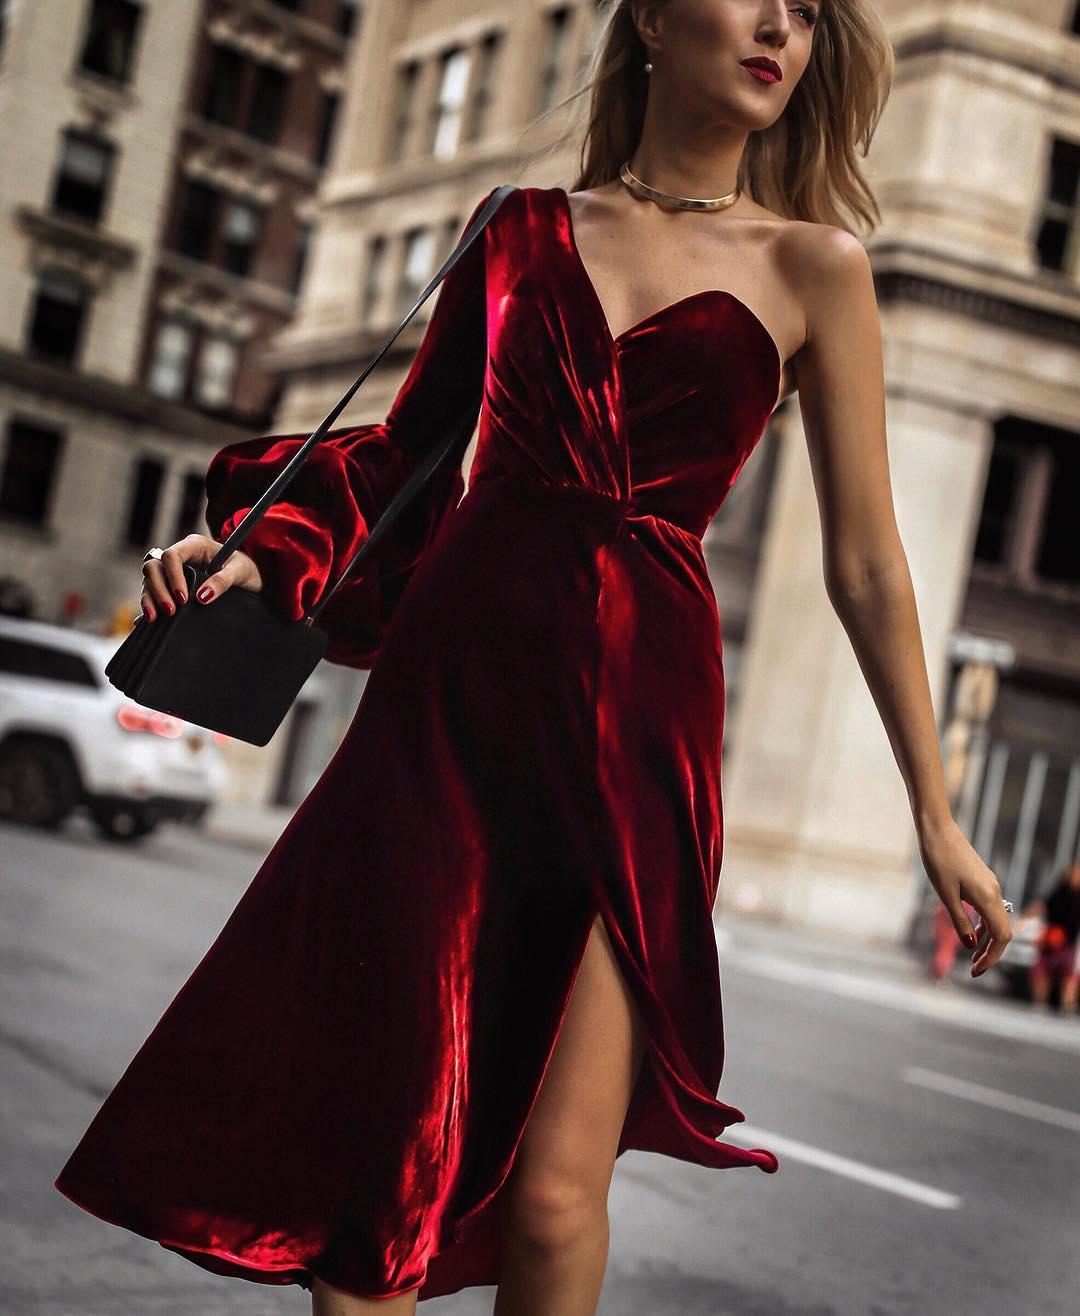 Бархатное платье 2020 фото 4